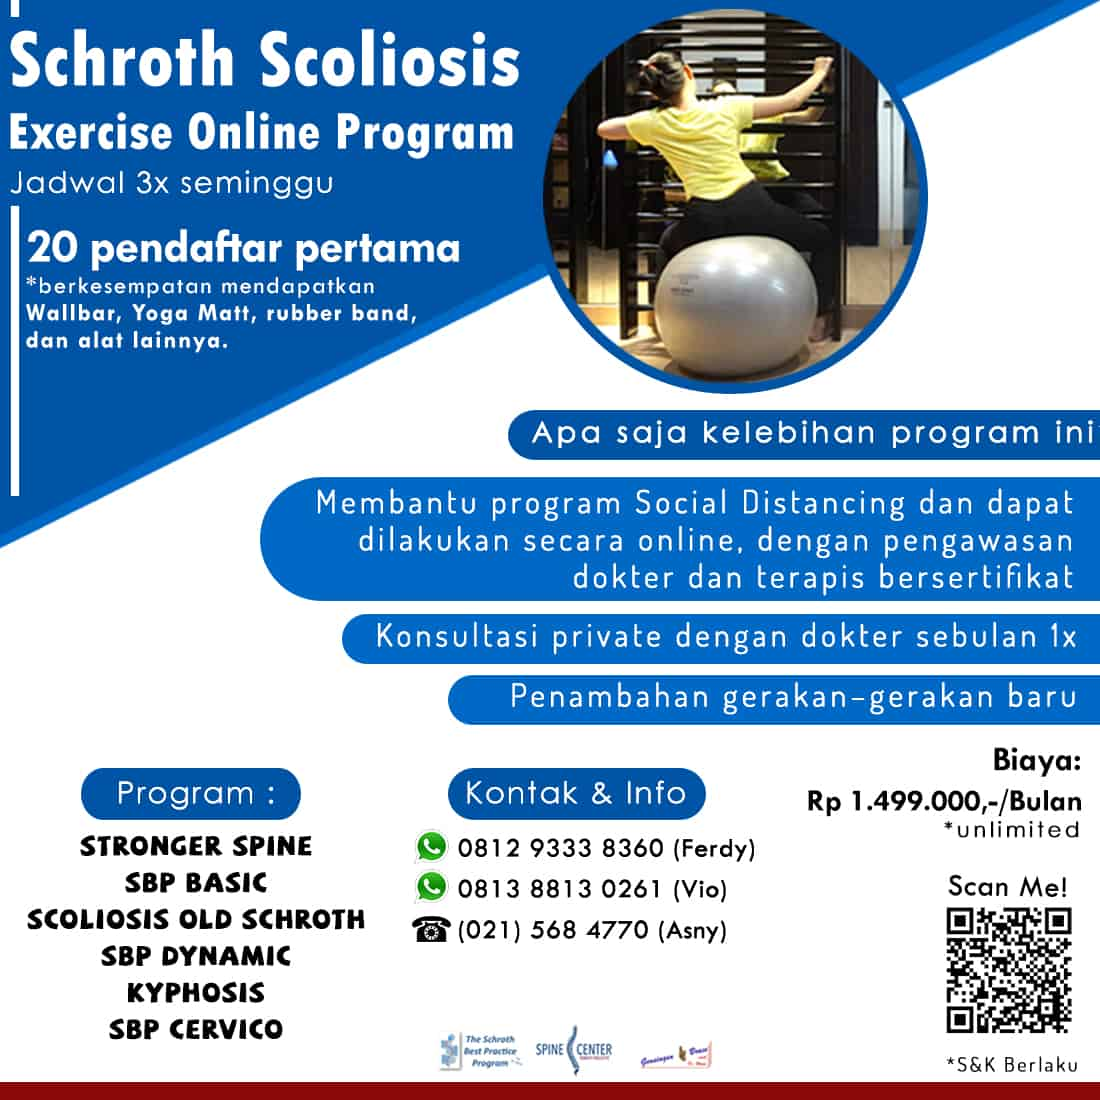 Schroth Exercise